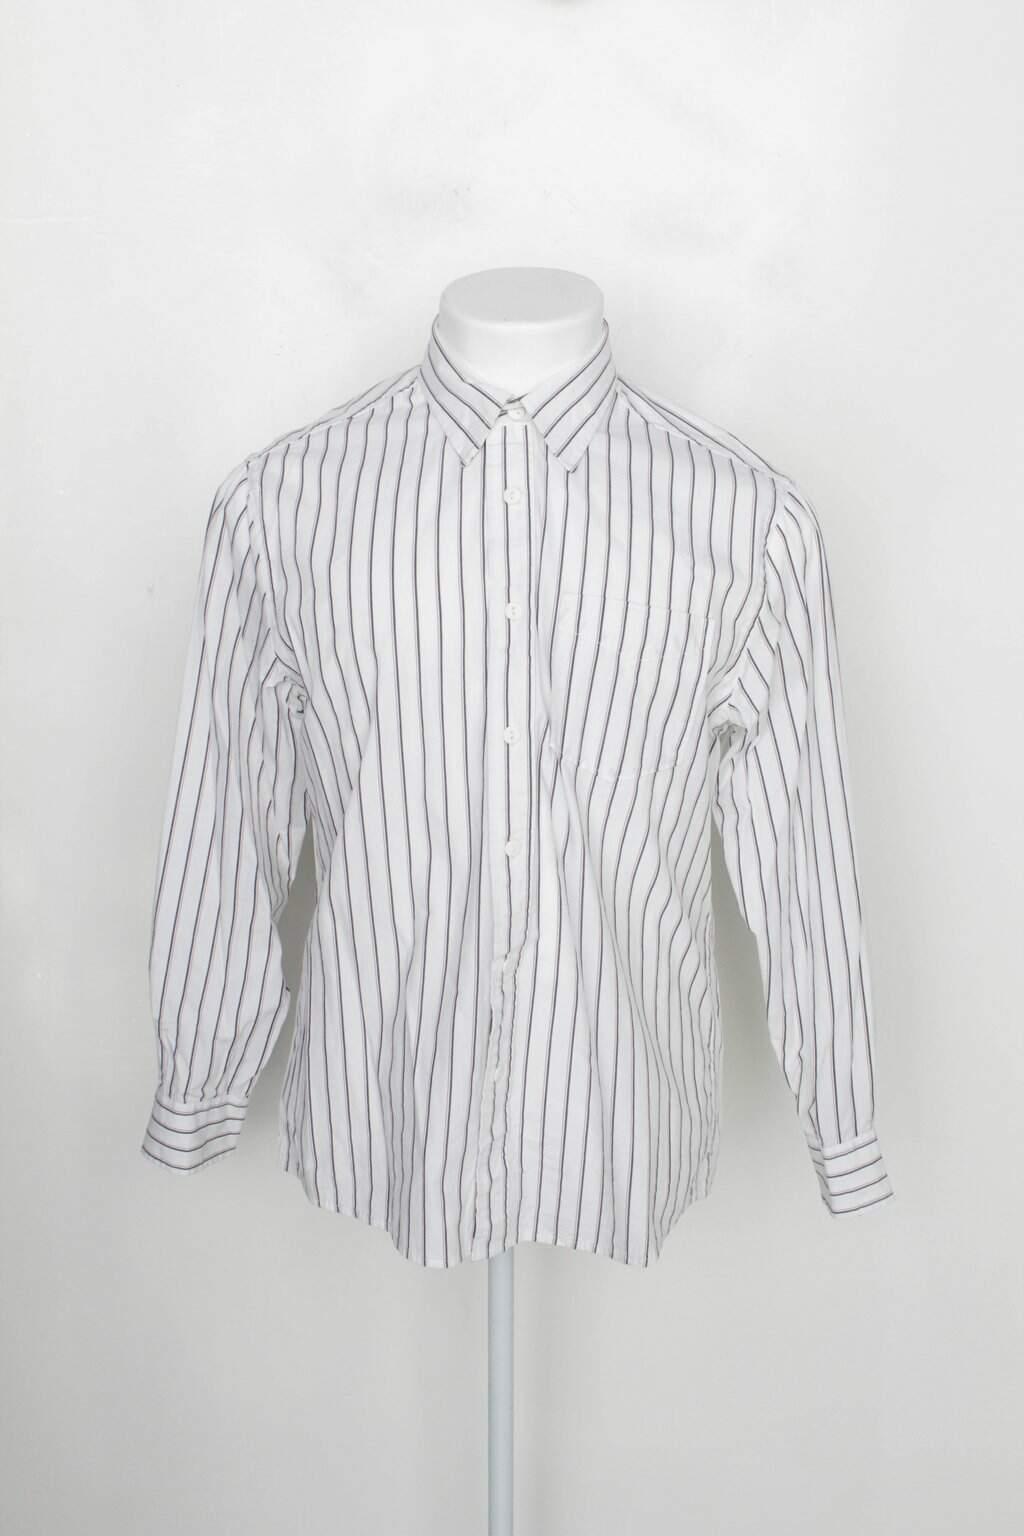 Camisa Hering Masculina Listrada